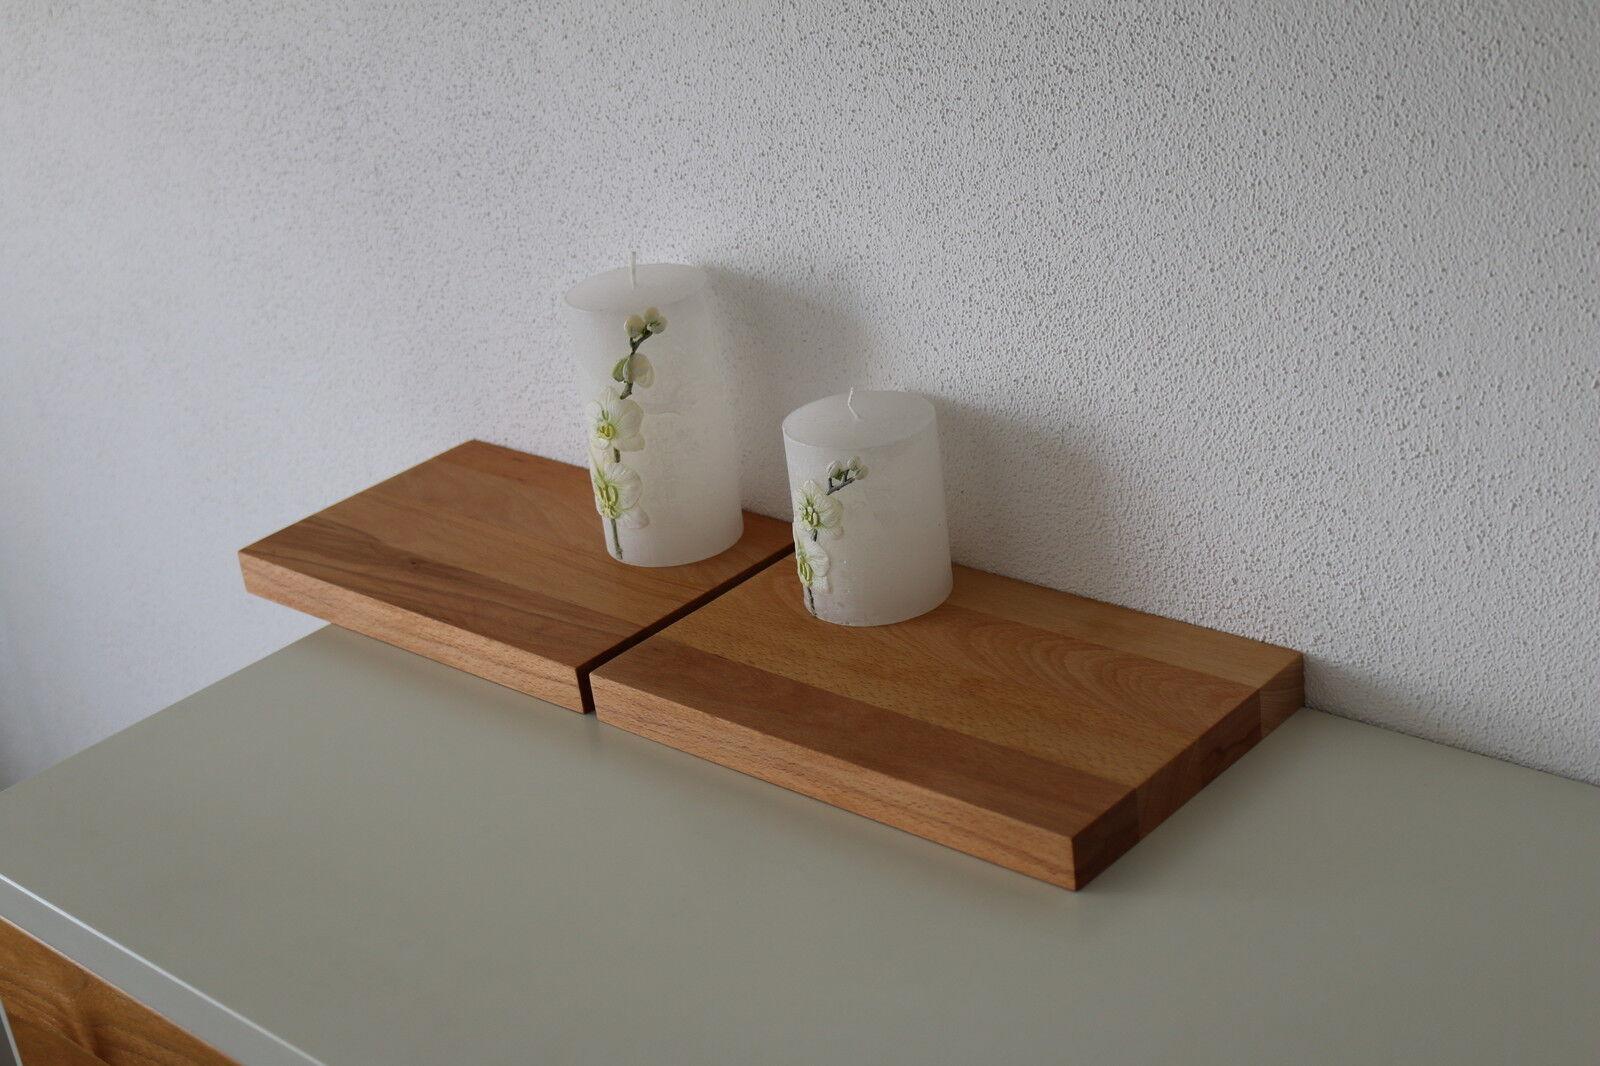 wandboard buche massiv holz board regal steckboard regalbrett neu au auf ma eur 85 00. Black Bedroom Furniture Sets. Home Design Ideas